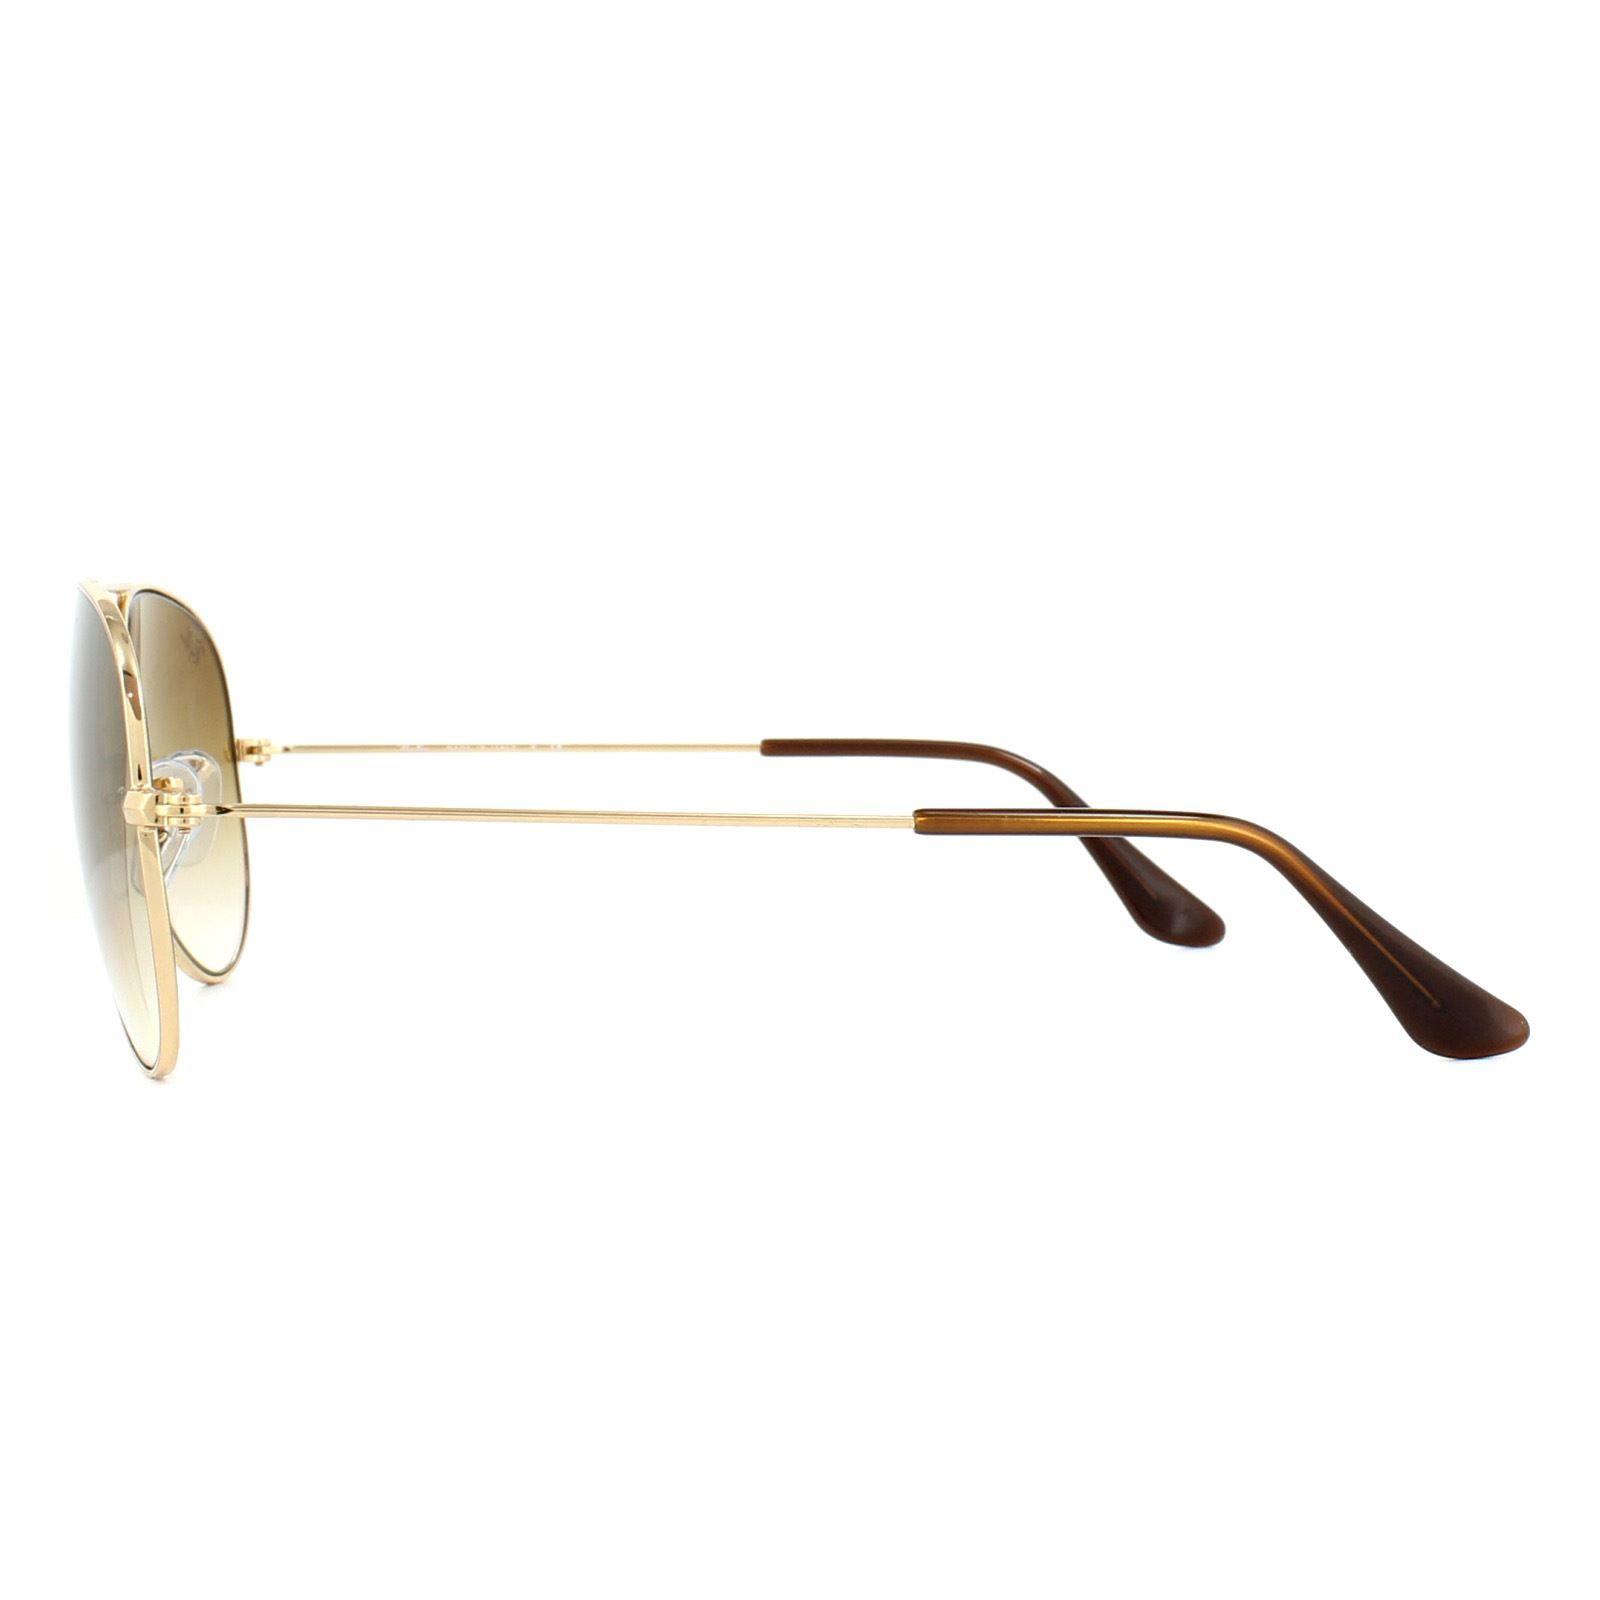 Ray-Ban Sunglasses Aviator 3025 001/51 Gold Brown Fade